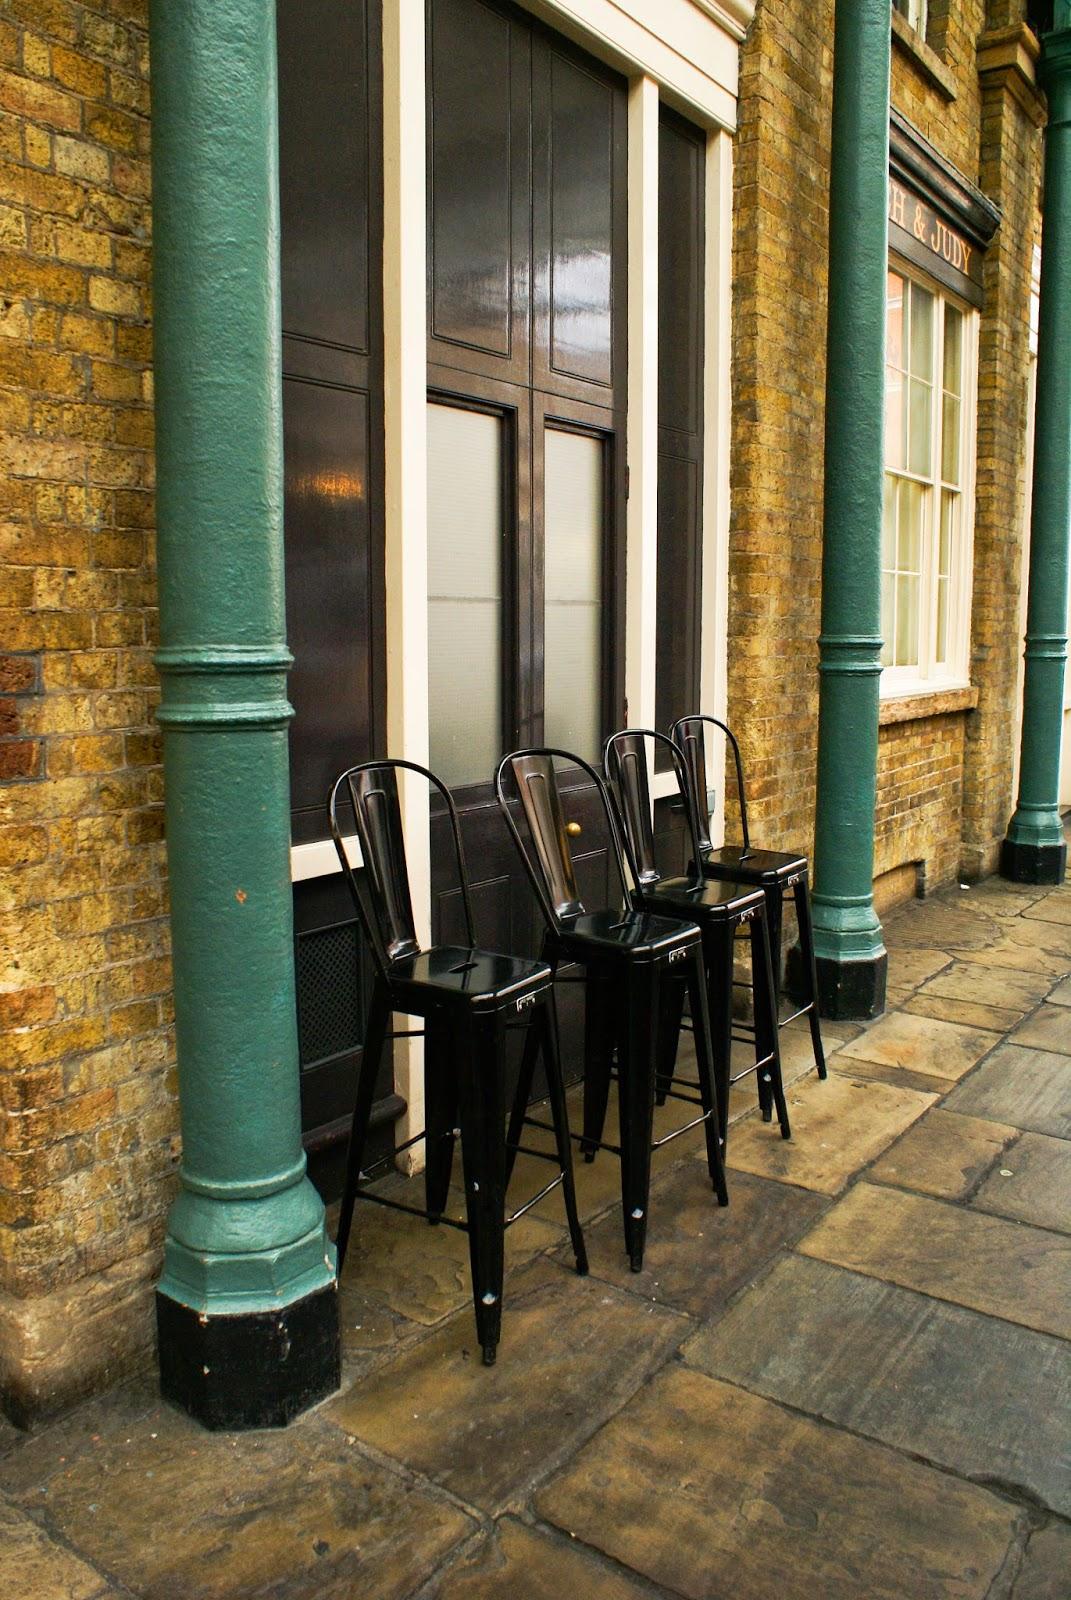 london covent garden uk england londres